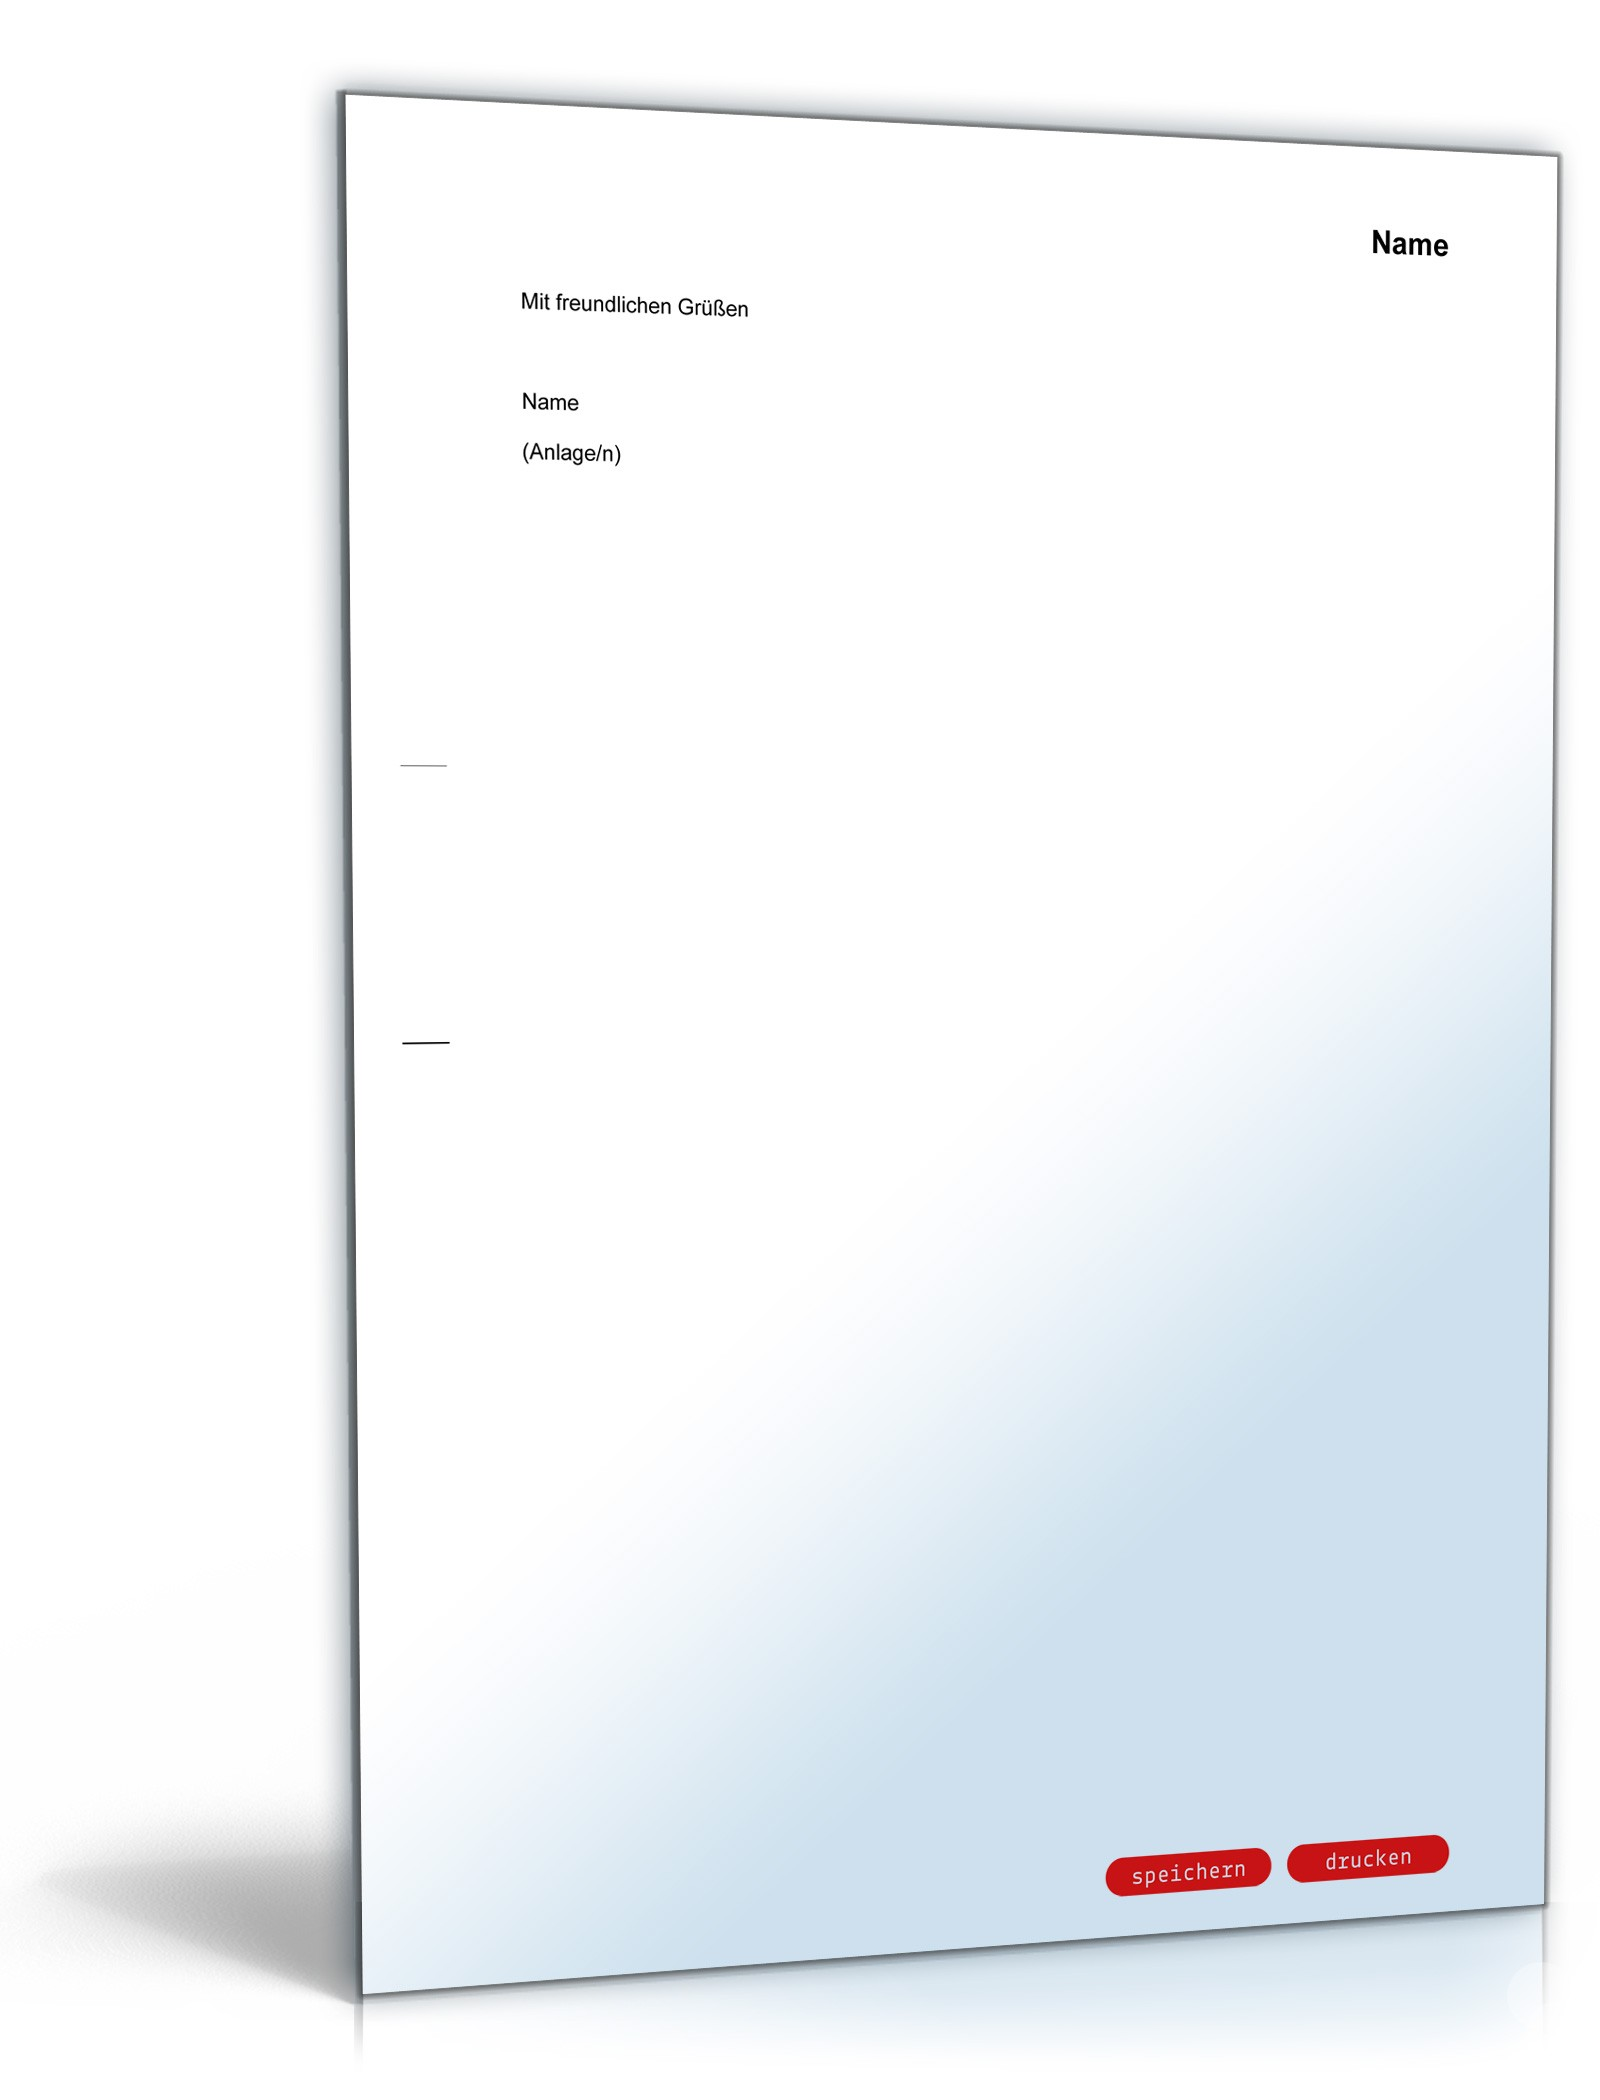 Vergleichsangebot An Privaten Gläubiger Muster Zum Download